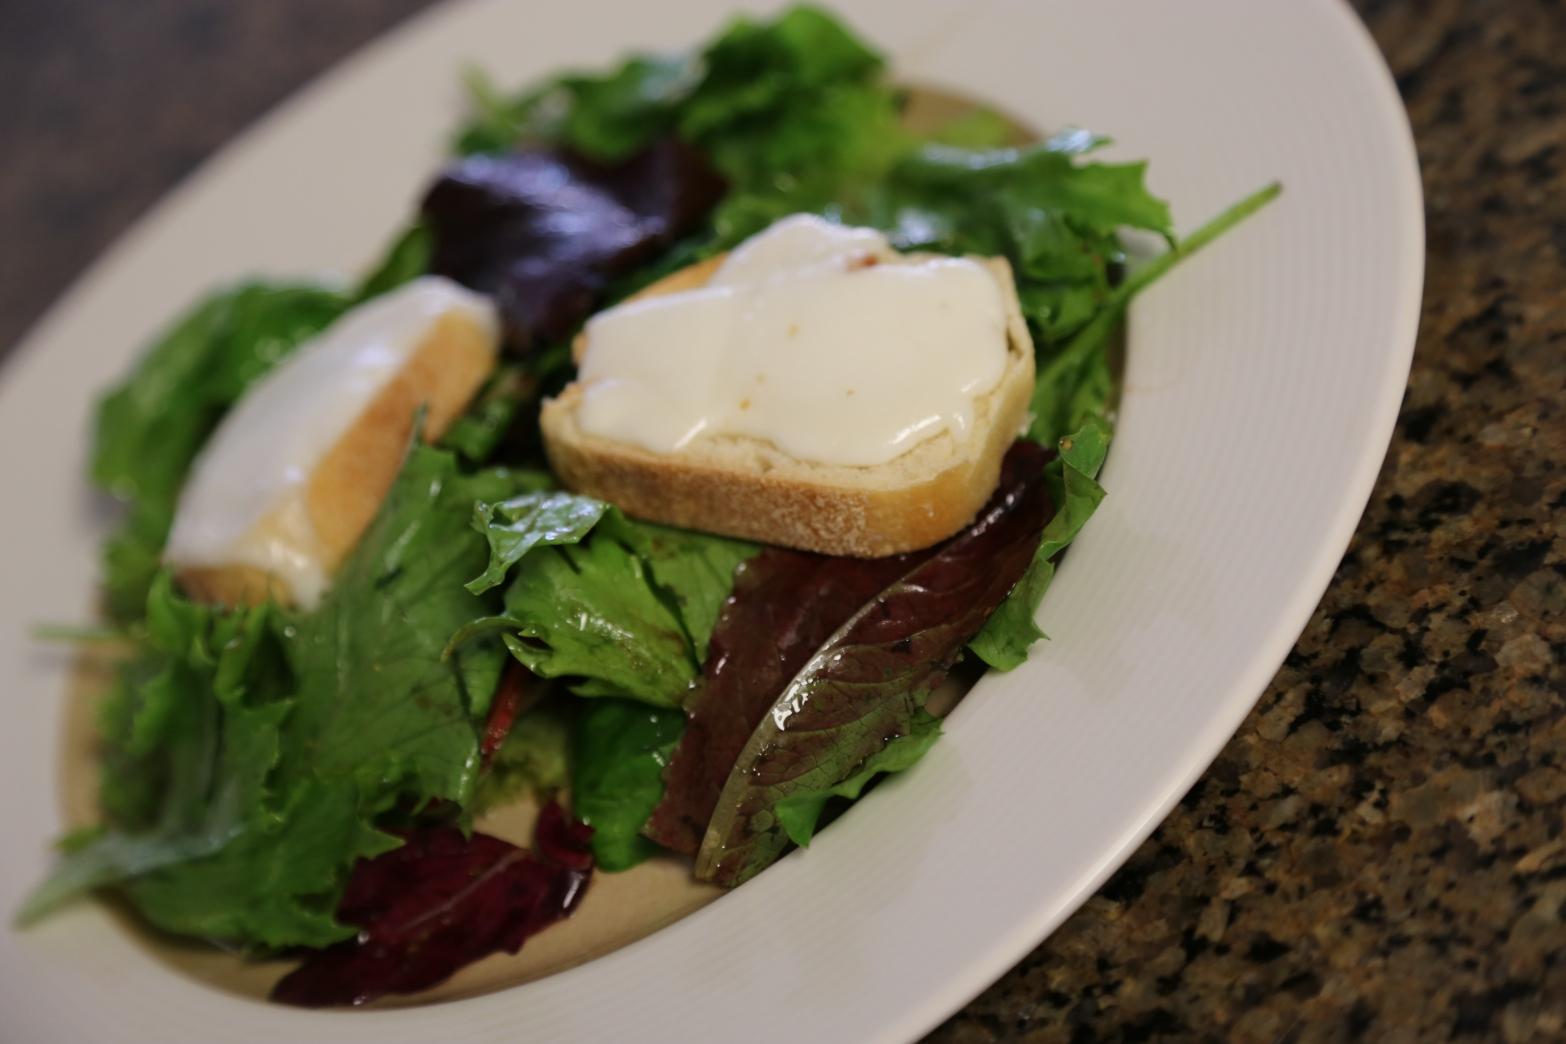 IMG_5295 PWC Salade au Chèvre Chaud